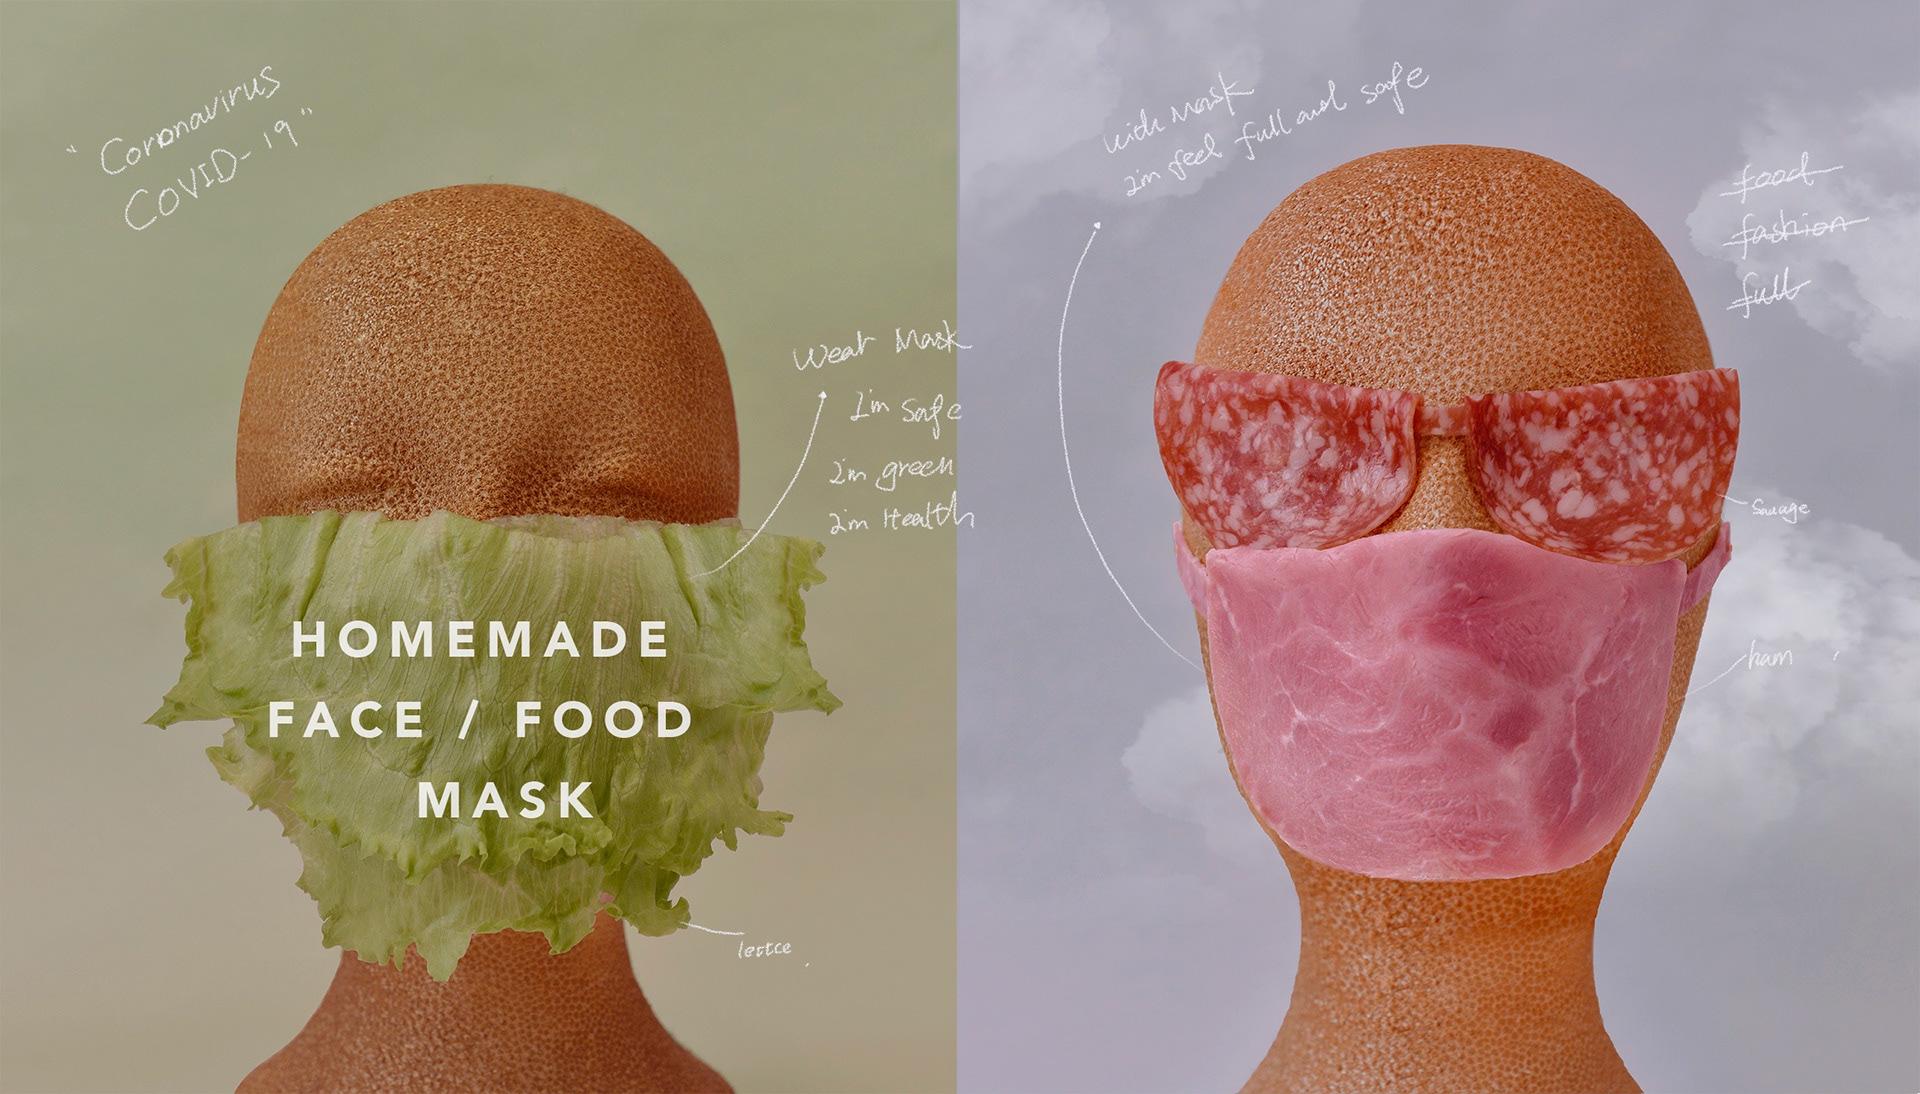 Homemade face food mask – Yum Tang - Artwort